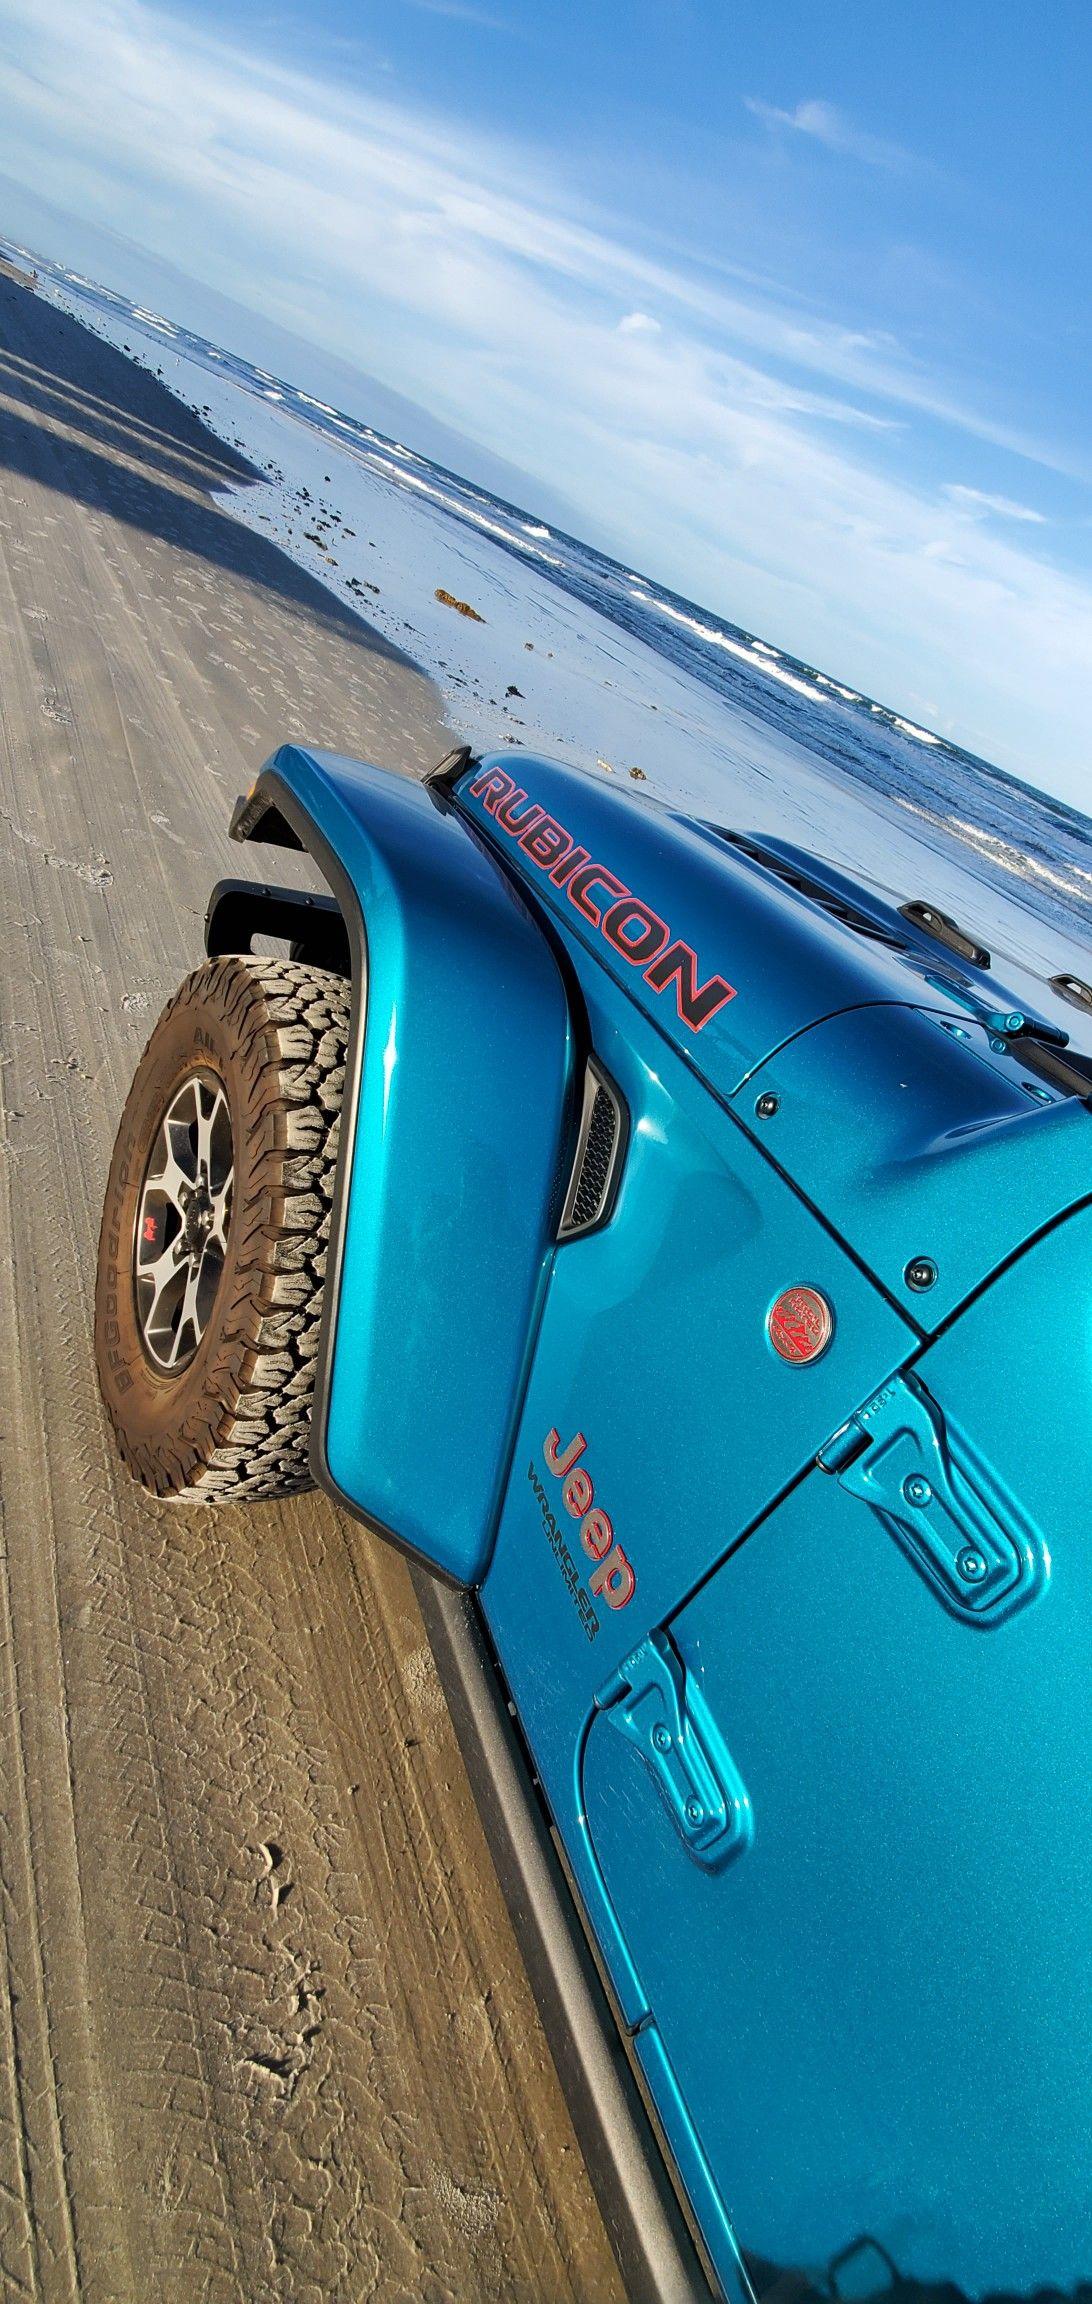 craigslist daytona beach transport jobs